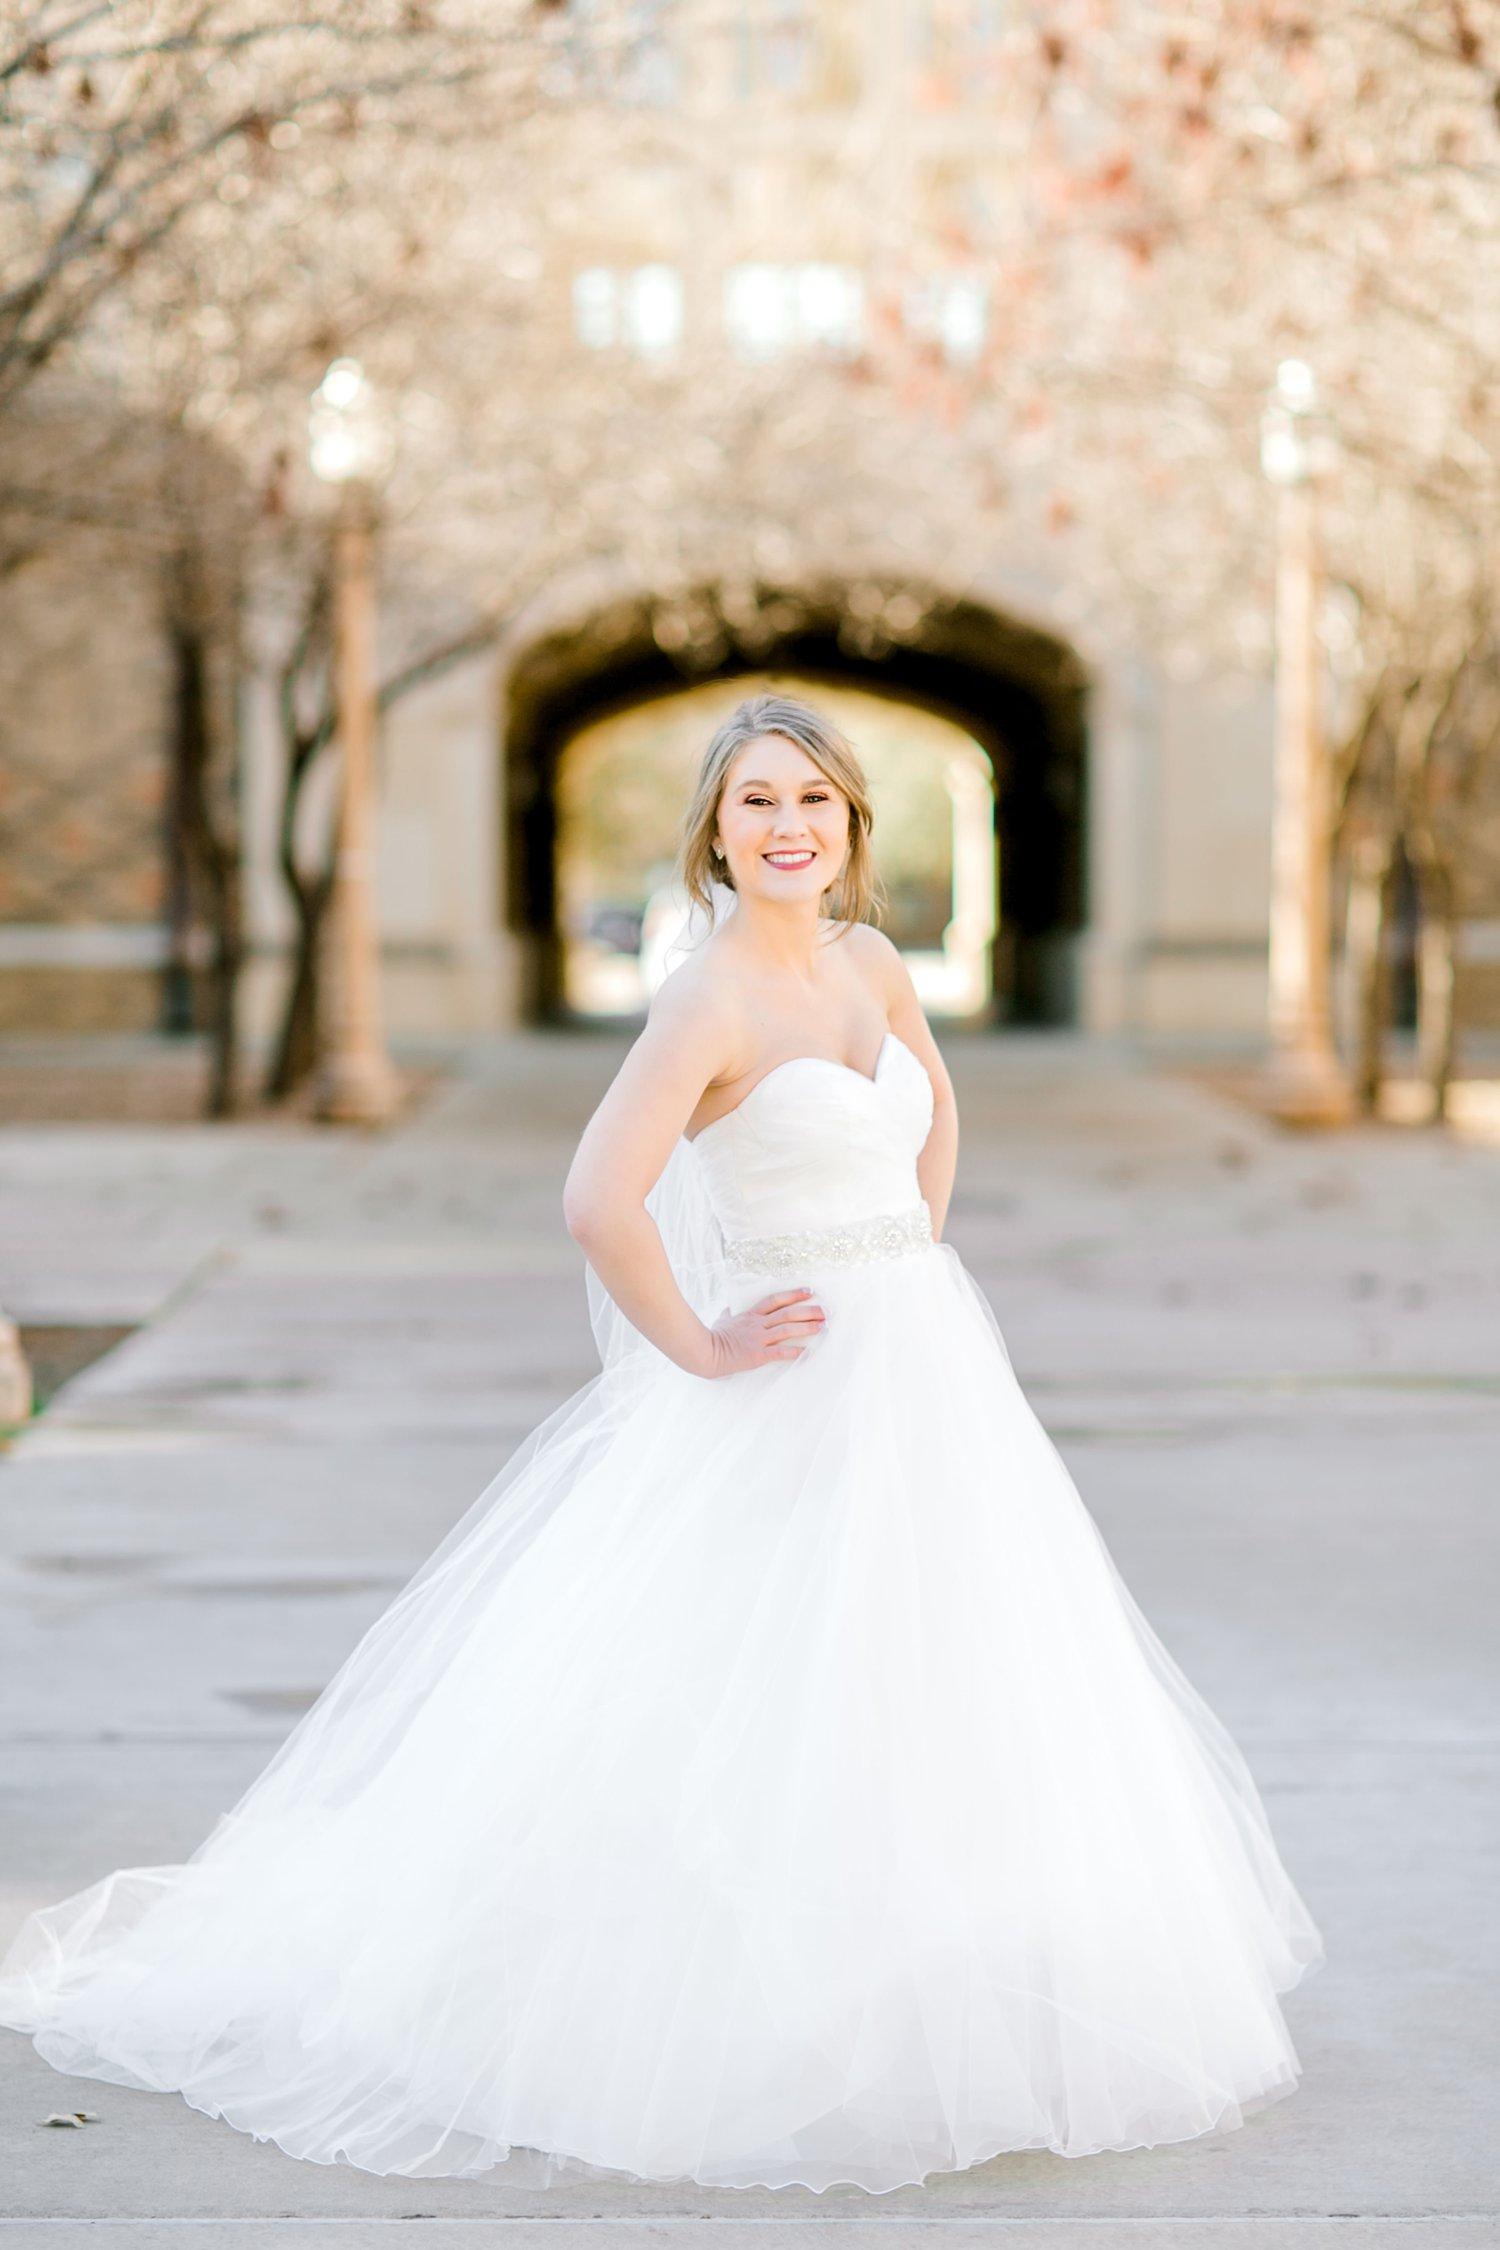 Kaila-cox-bridals-lubbock-photographer0030.jpg